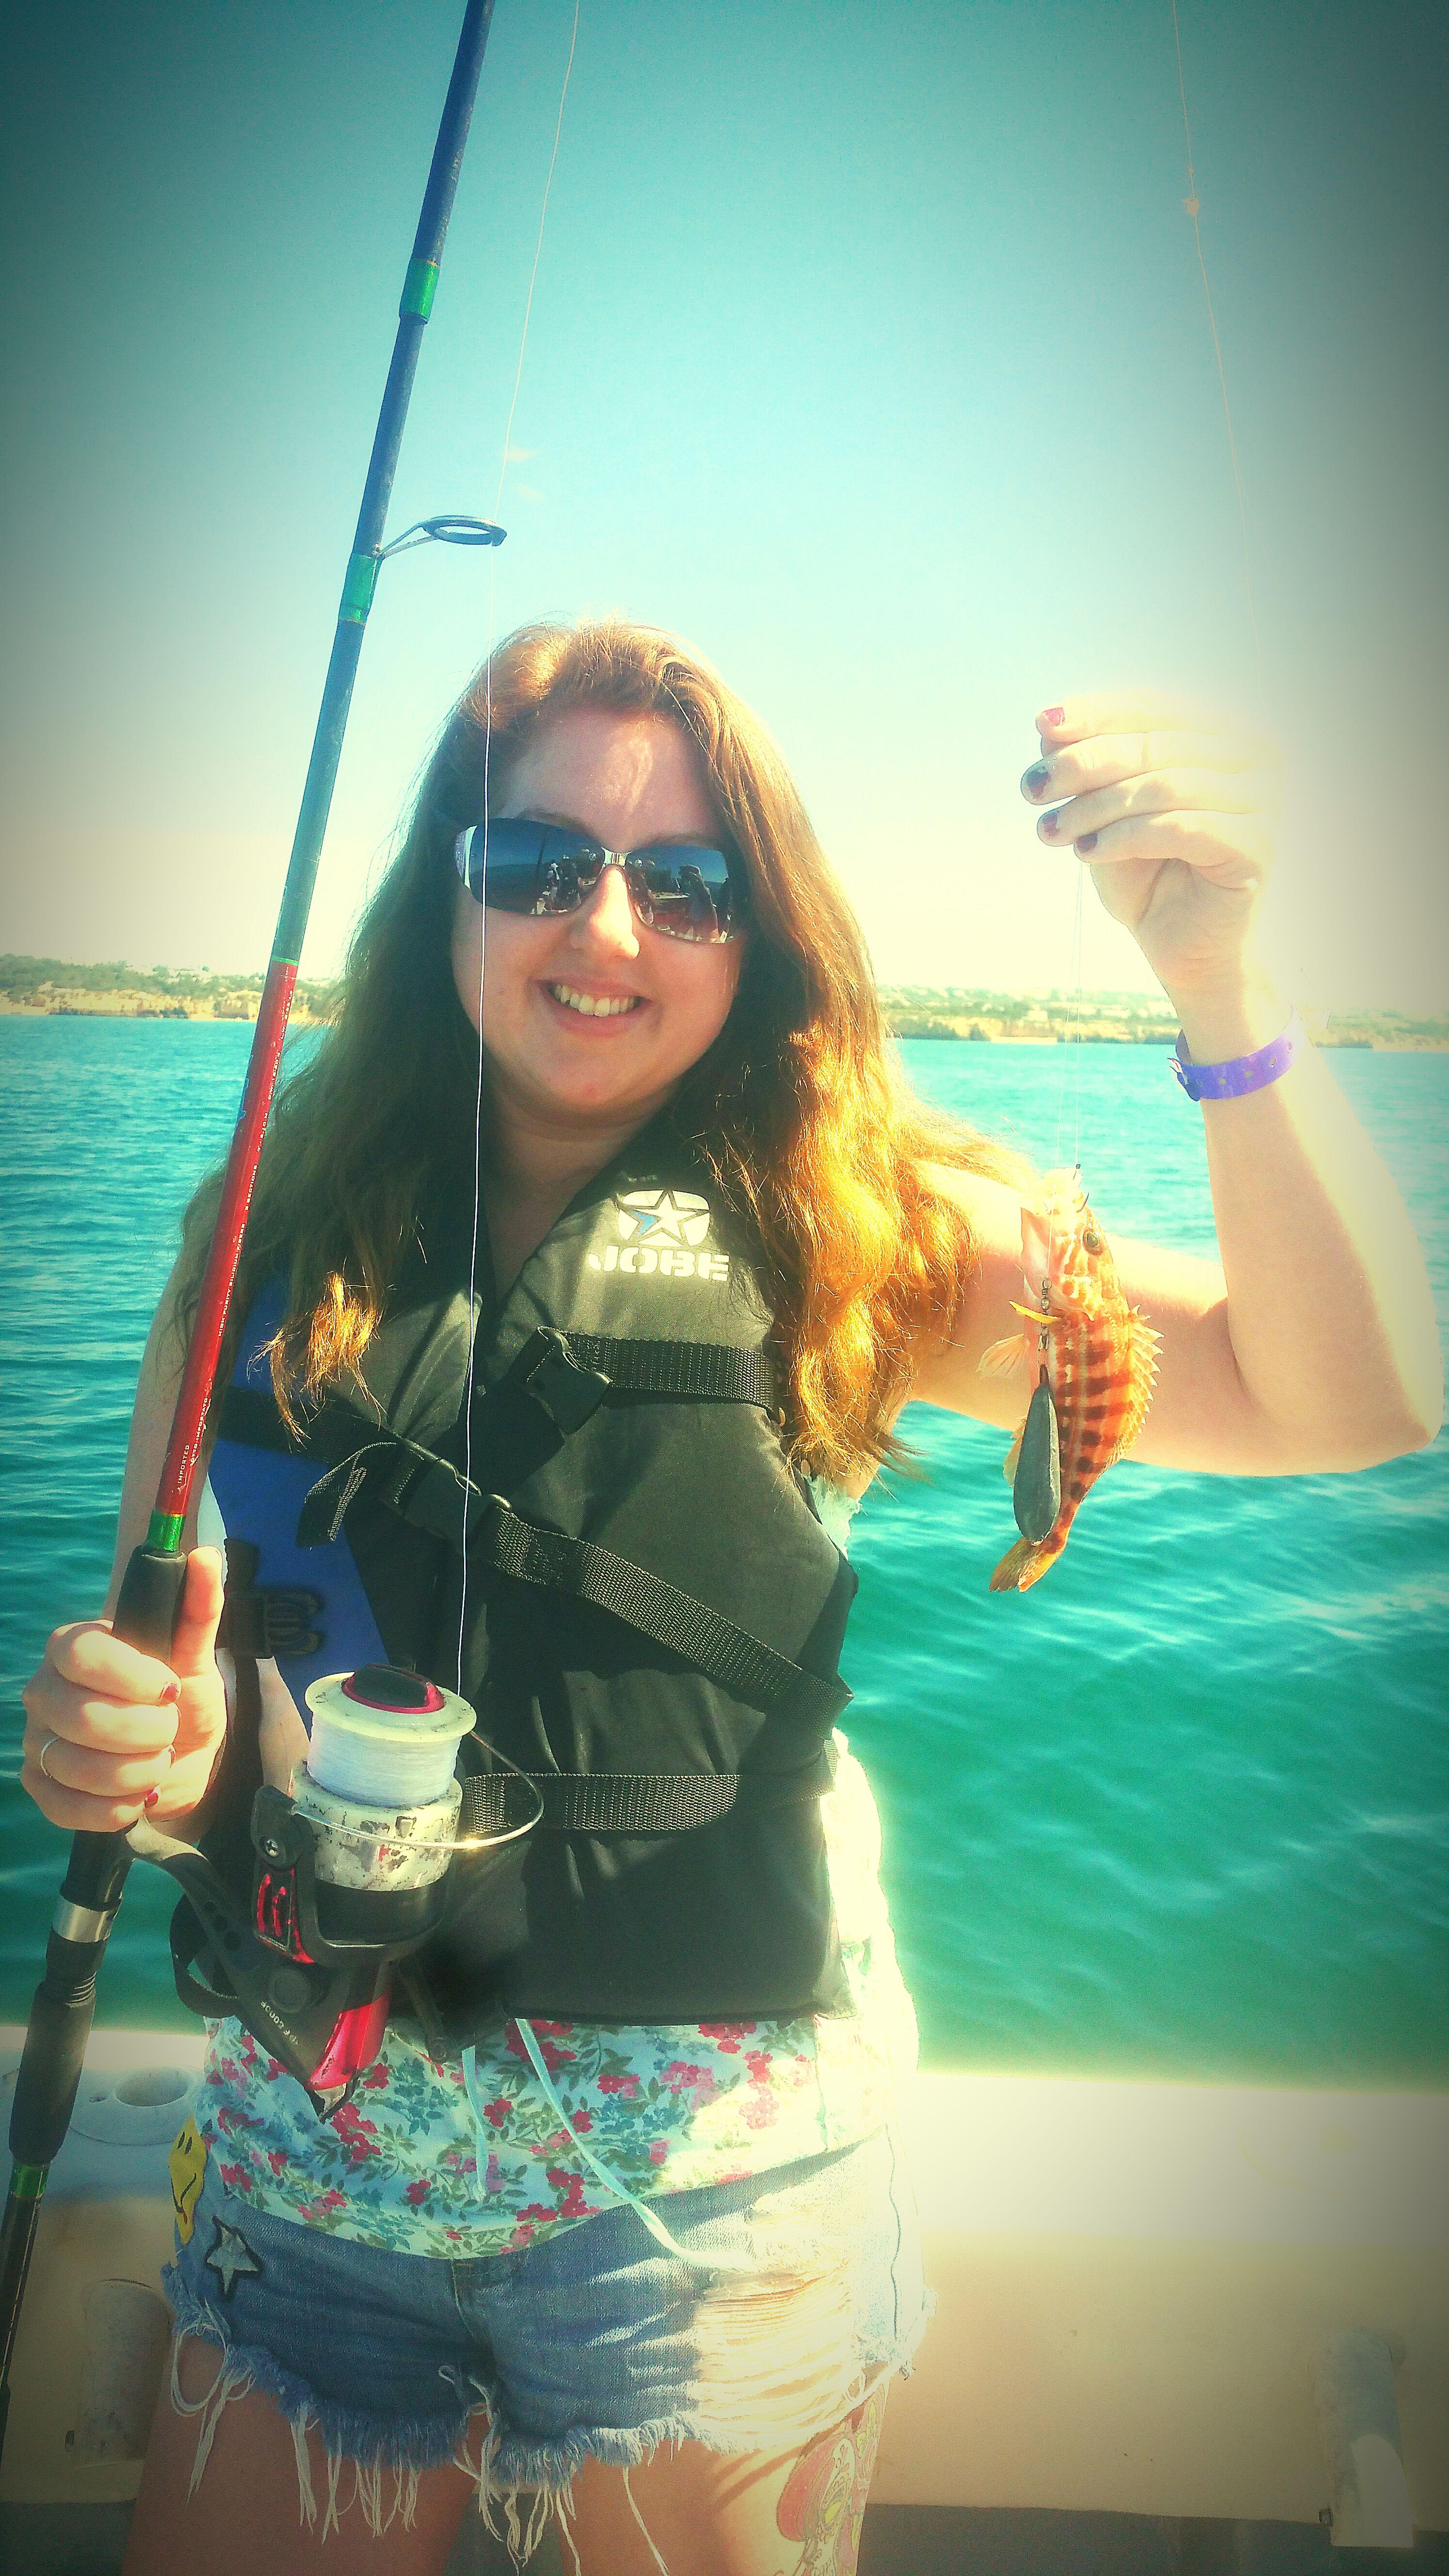 Sea Fishing Portugal Albeferia Sea Fishes Beach Blue Sea Pictureoftheday Picoftheday Friends